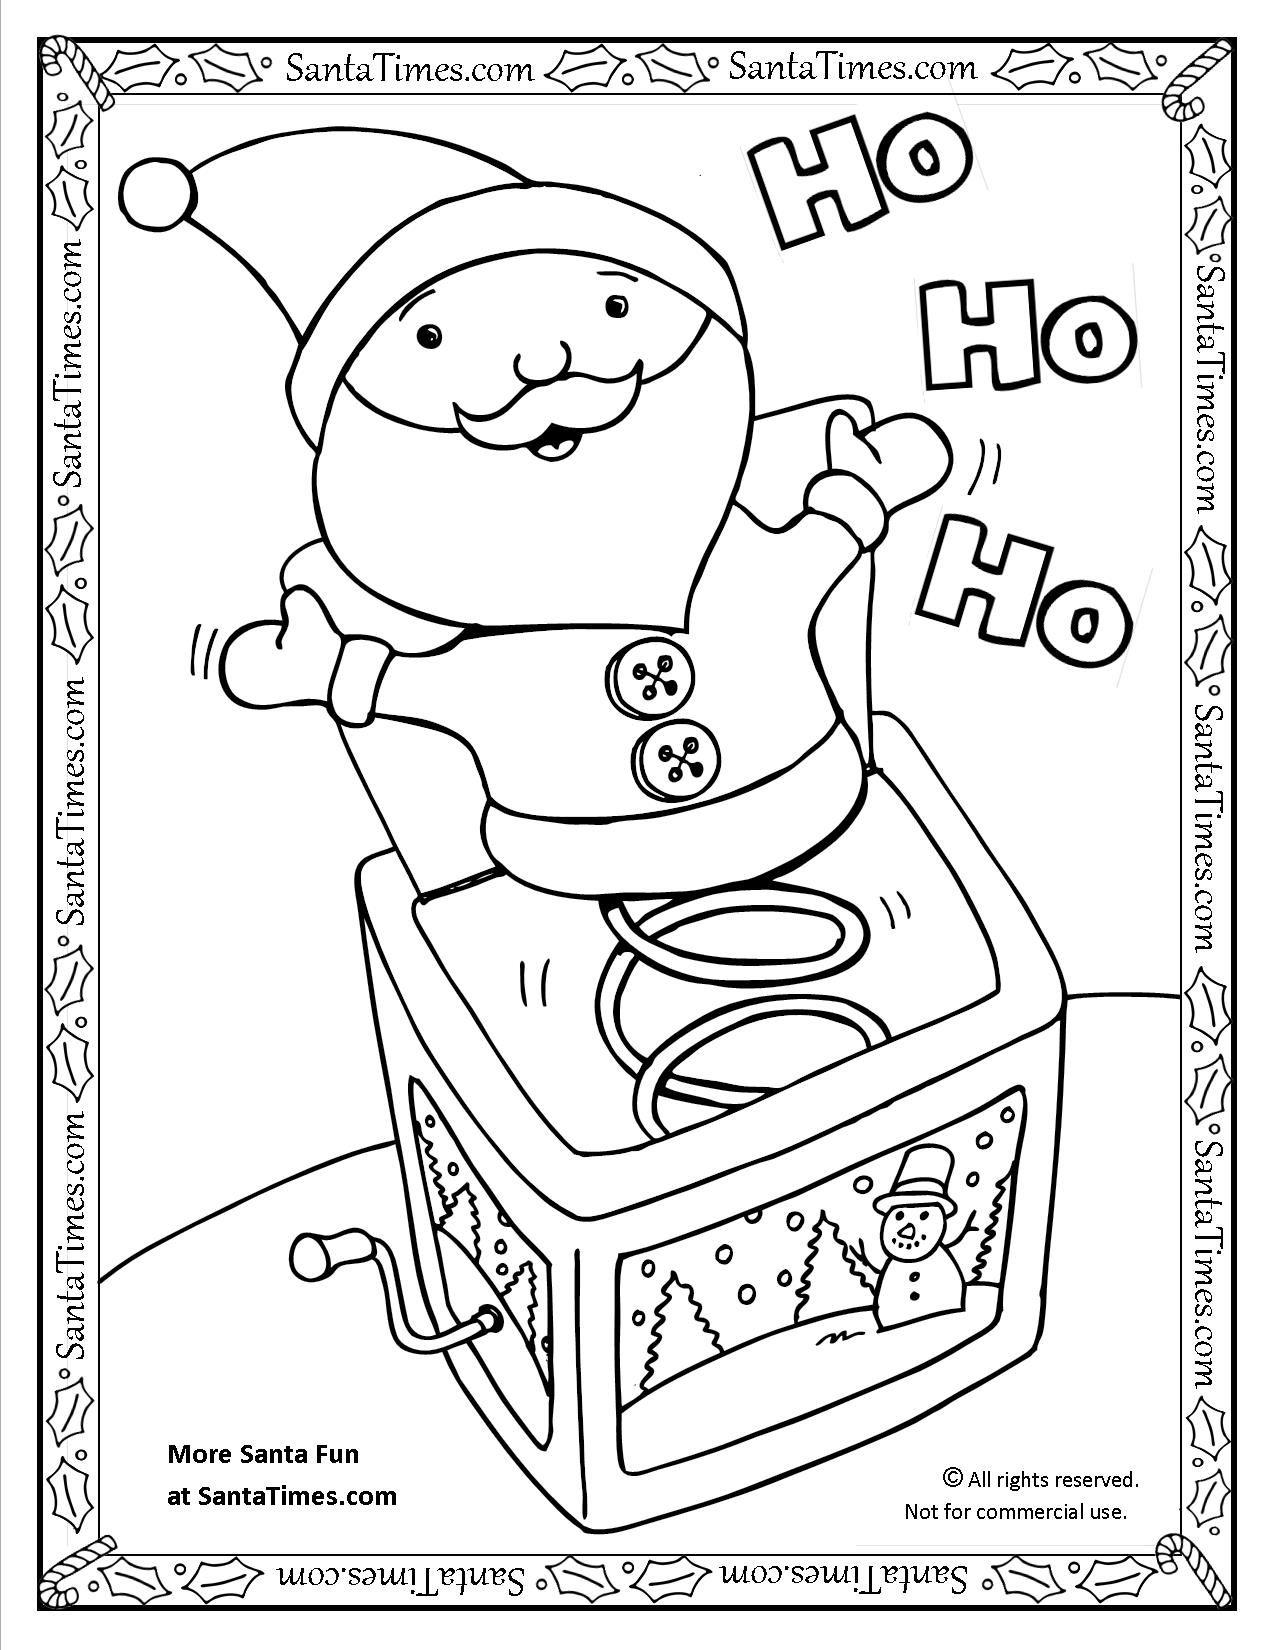 Santa Jack In The Box Coloring Page Printout More Fun